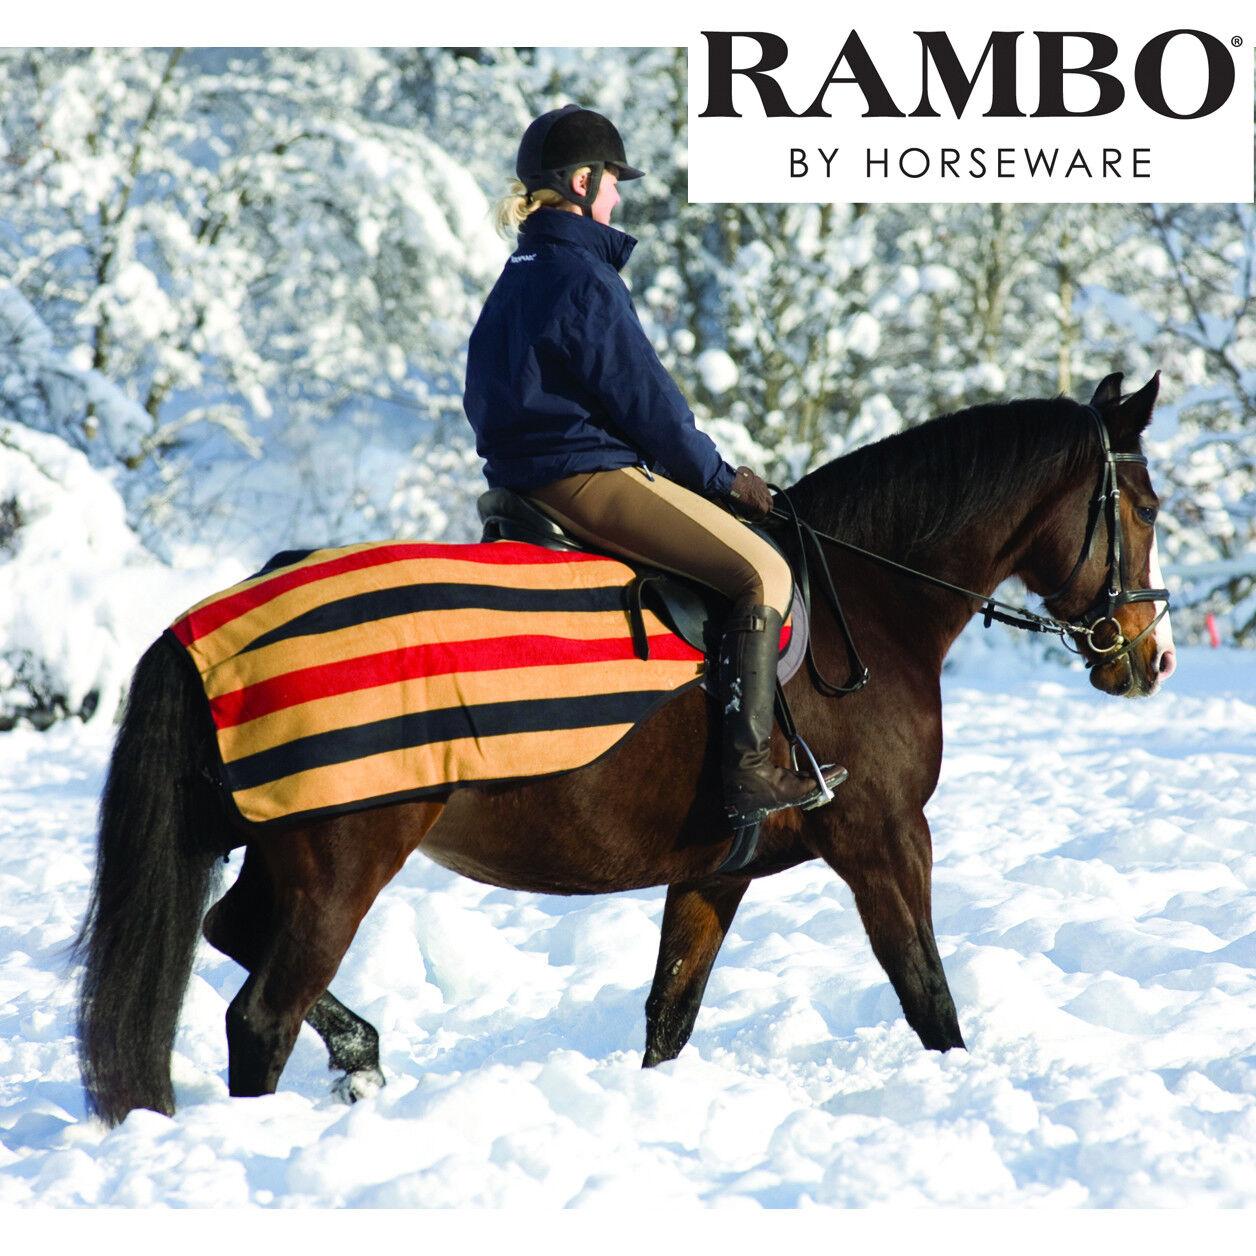 Horseware Rambo Fleece Competition Exercise Sheet